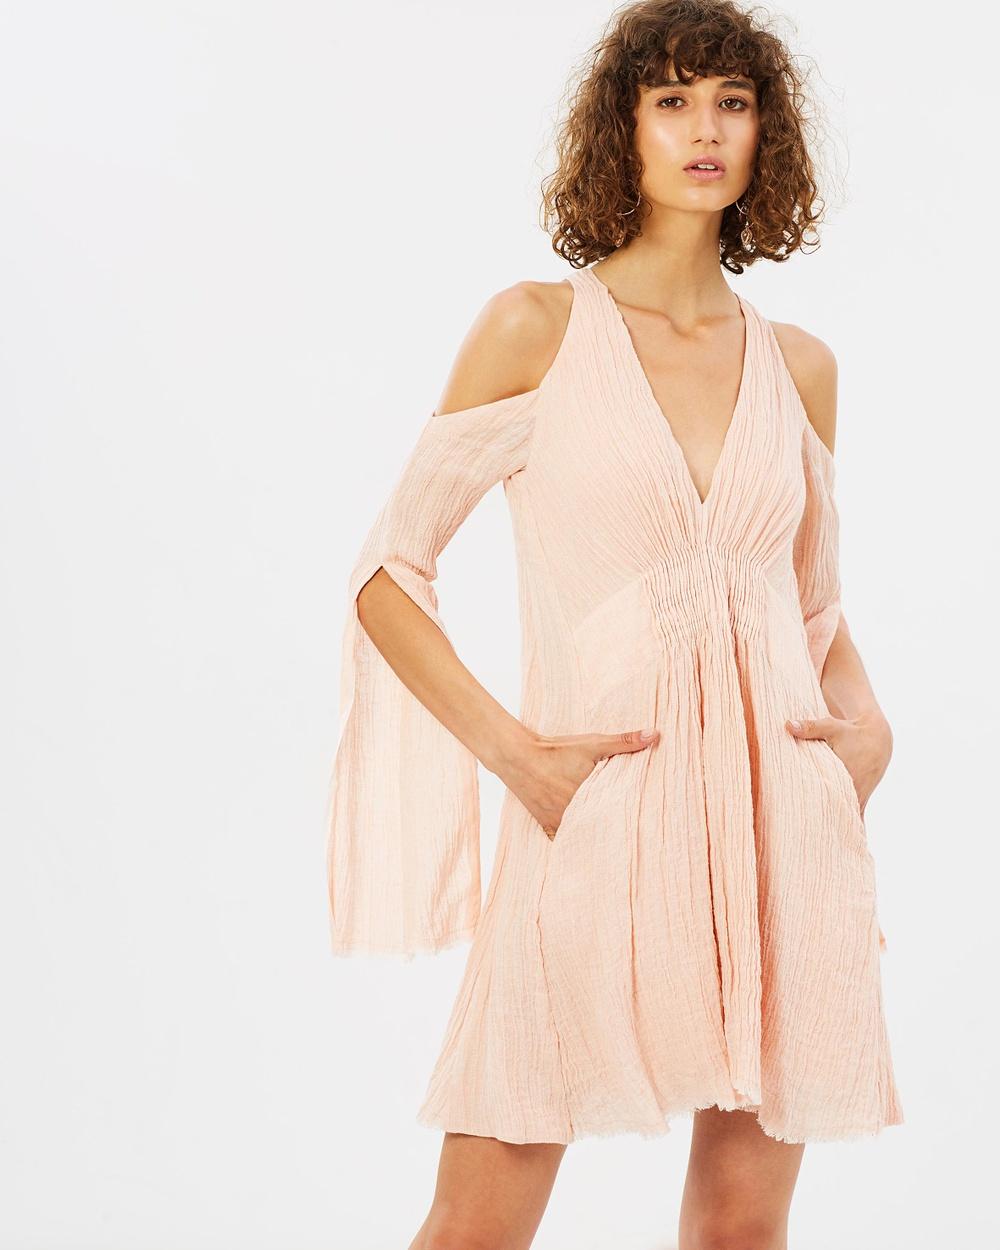 KITX Faithful Keeper Dress Dresses Sunset Faithful Keeper Dress